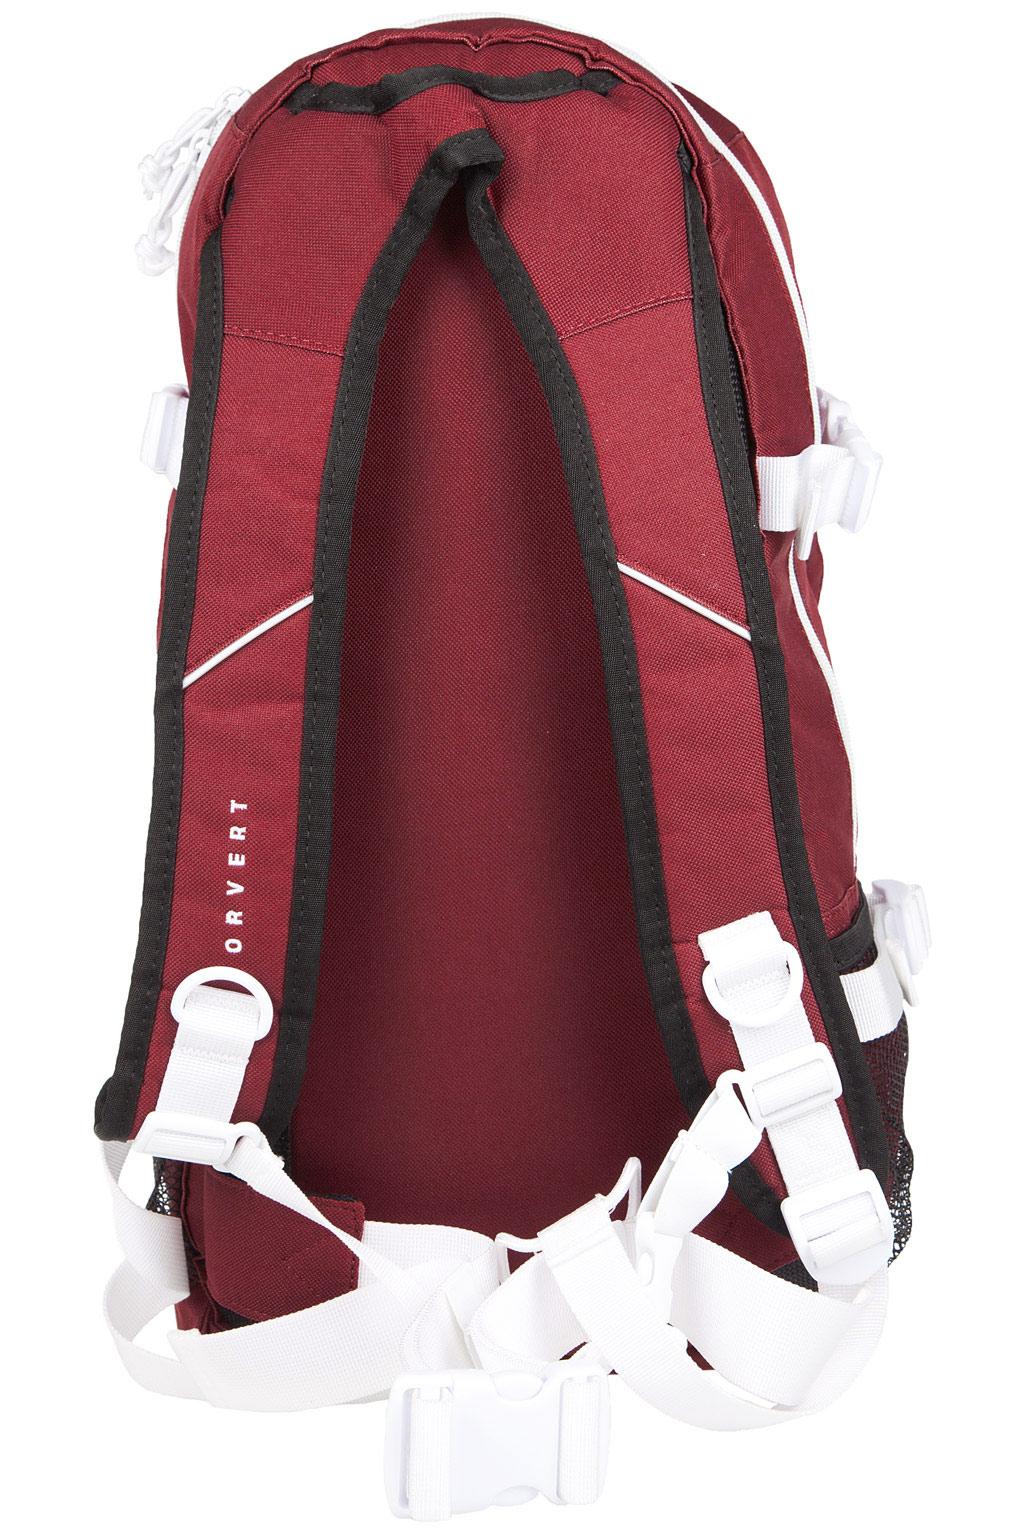 forvert ice louis backpack 20l burgundy buy at skatedeluxe. Black Bedroom Furniture Sets. Home Design Ideas